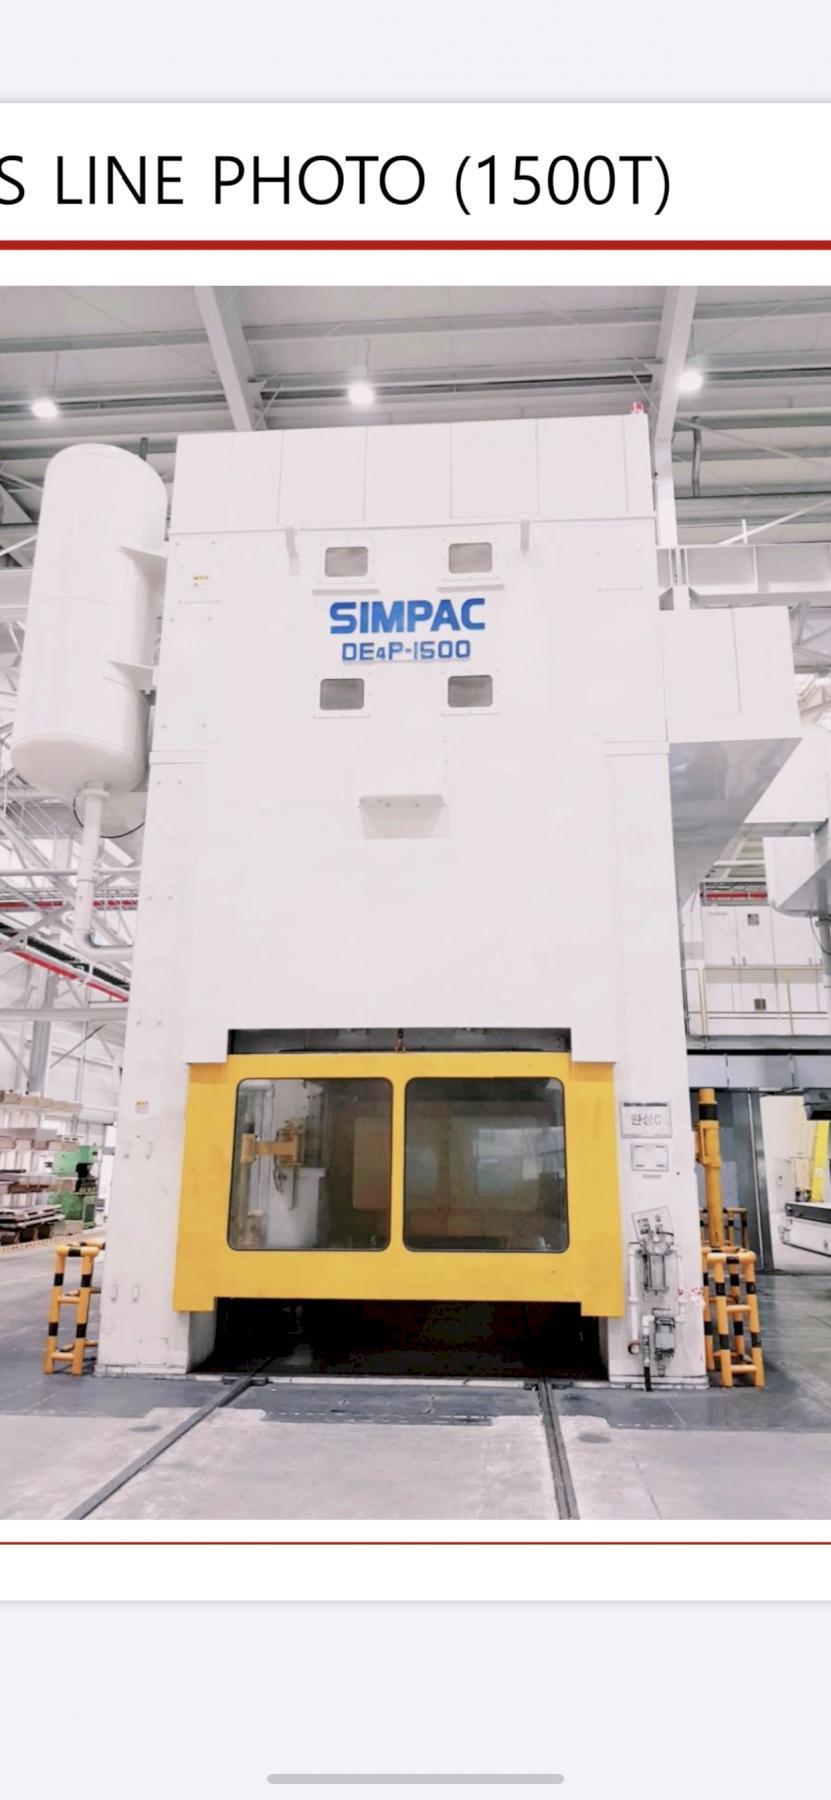 Simpac tandem press line 2014